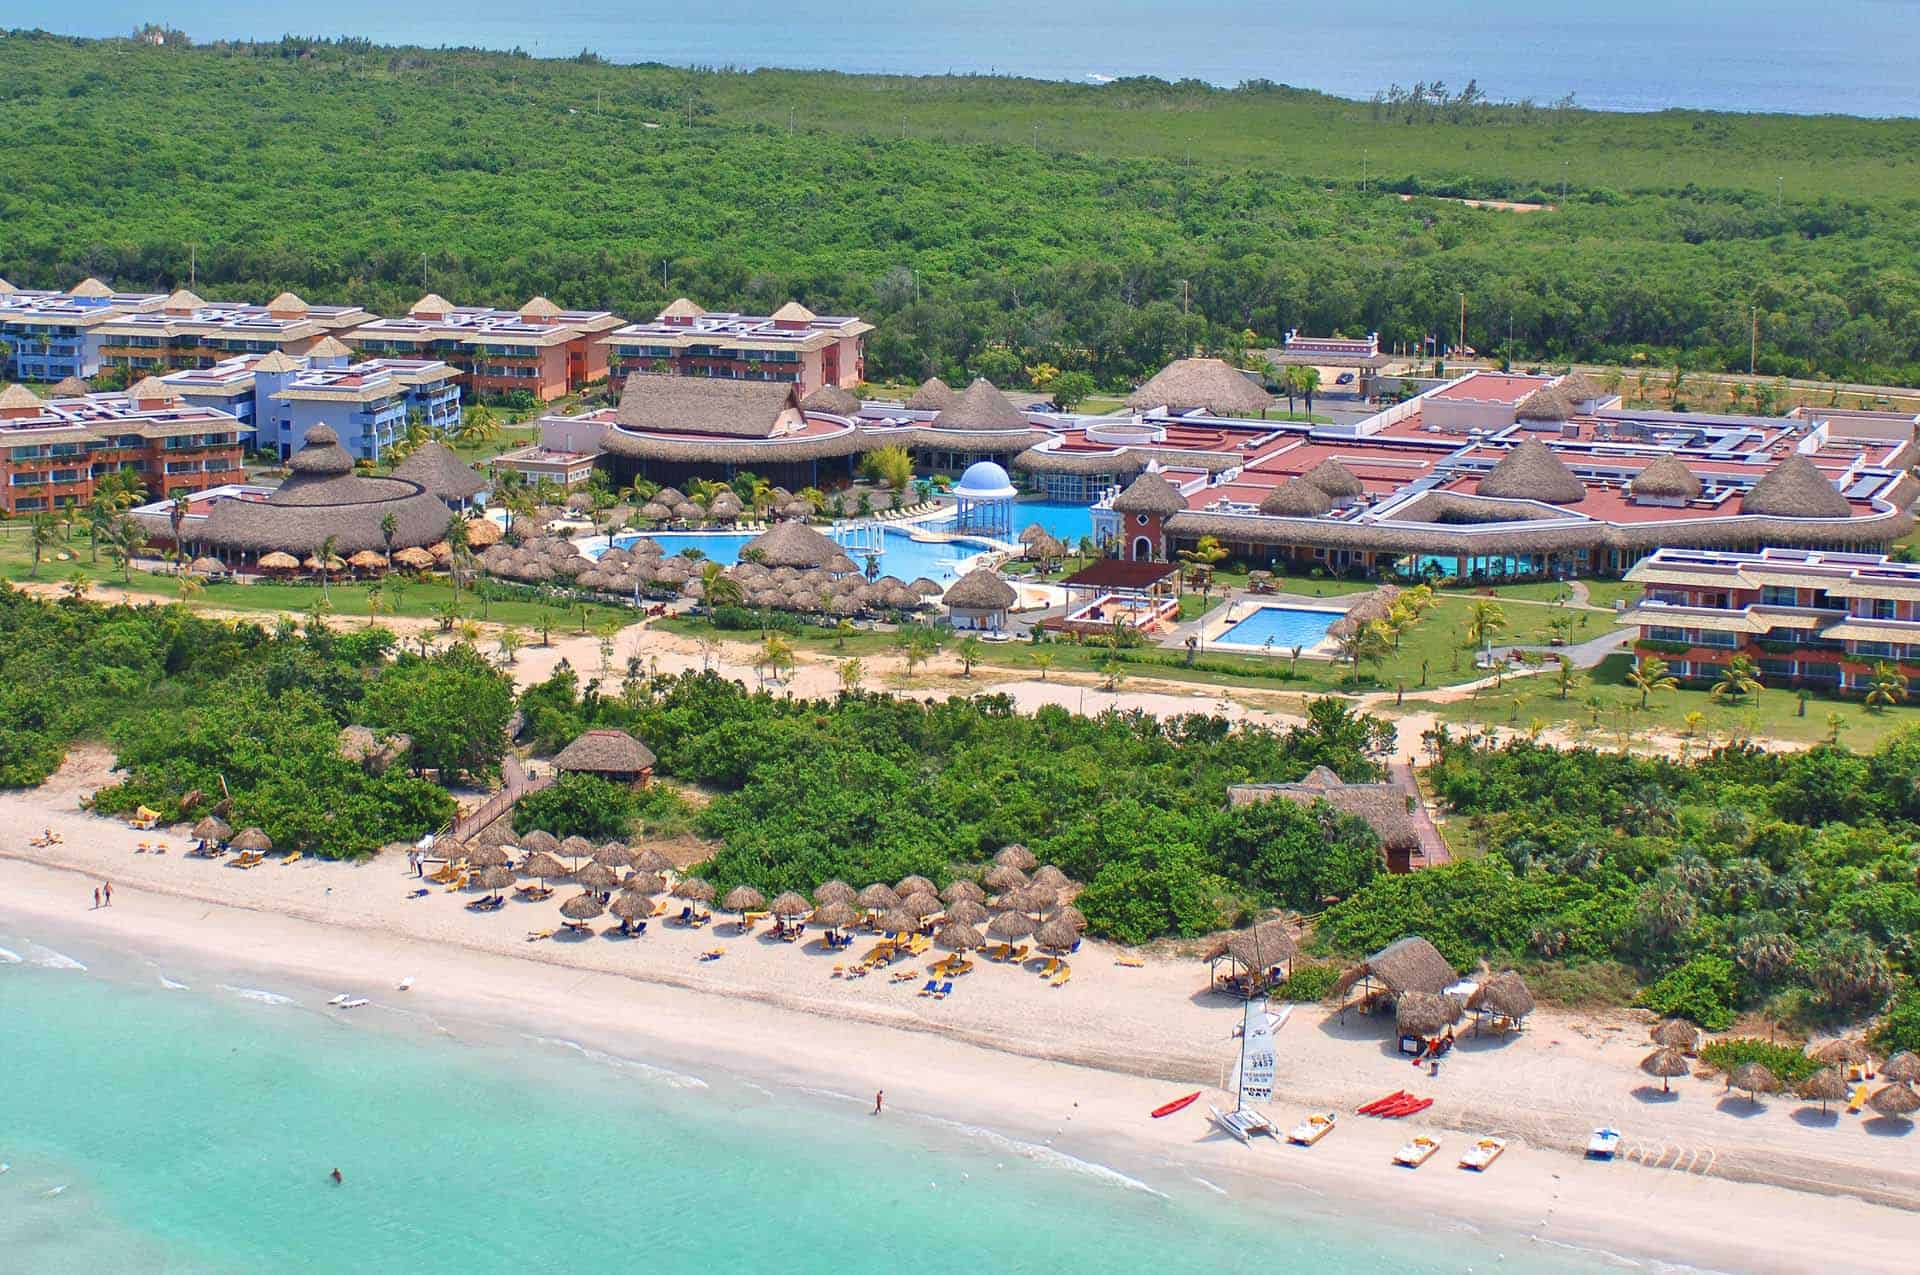 varadero hotel piscine plage mer cuba autrement 1